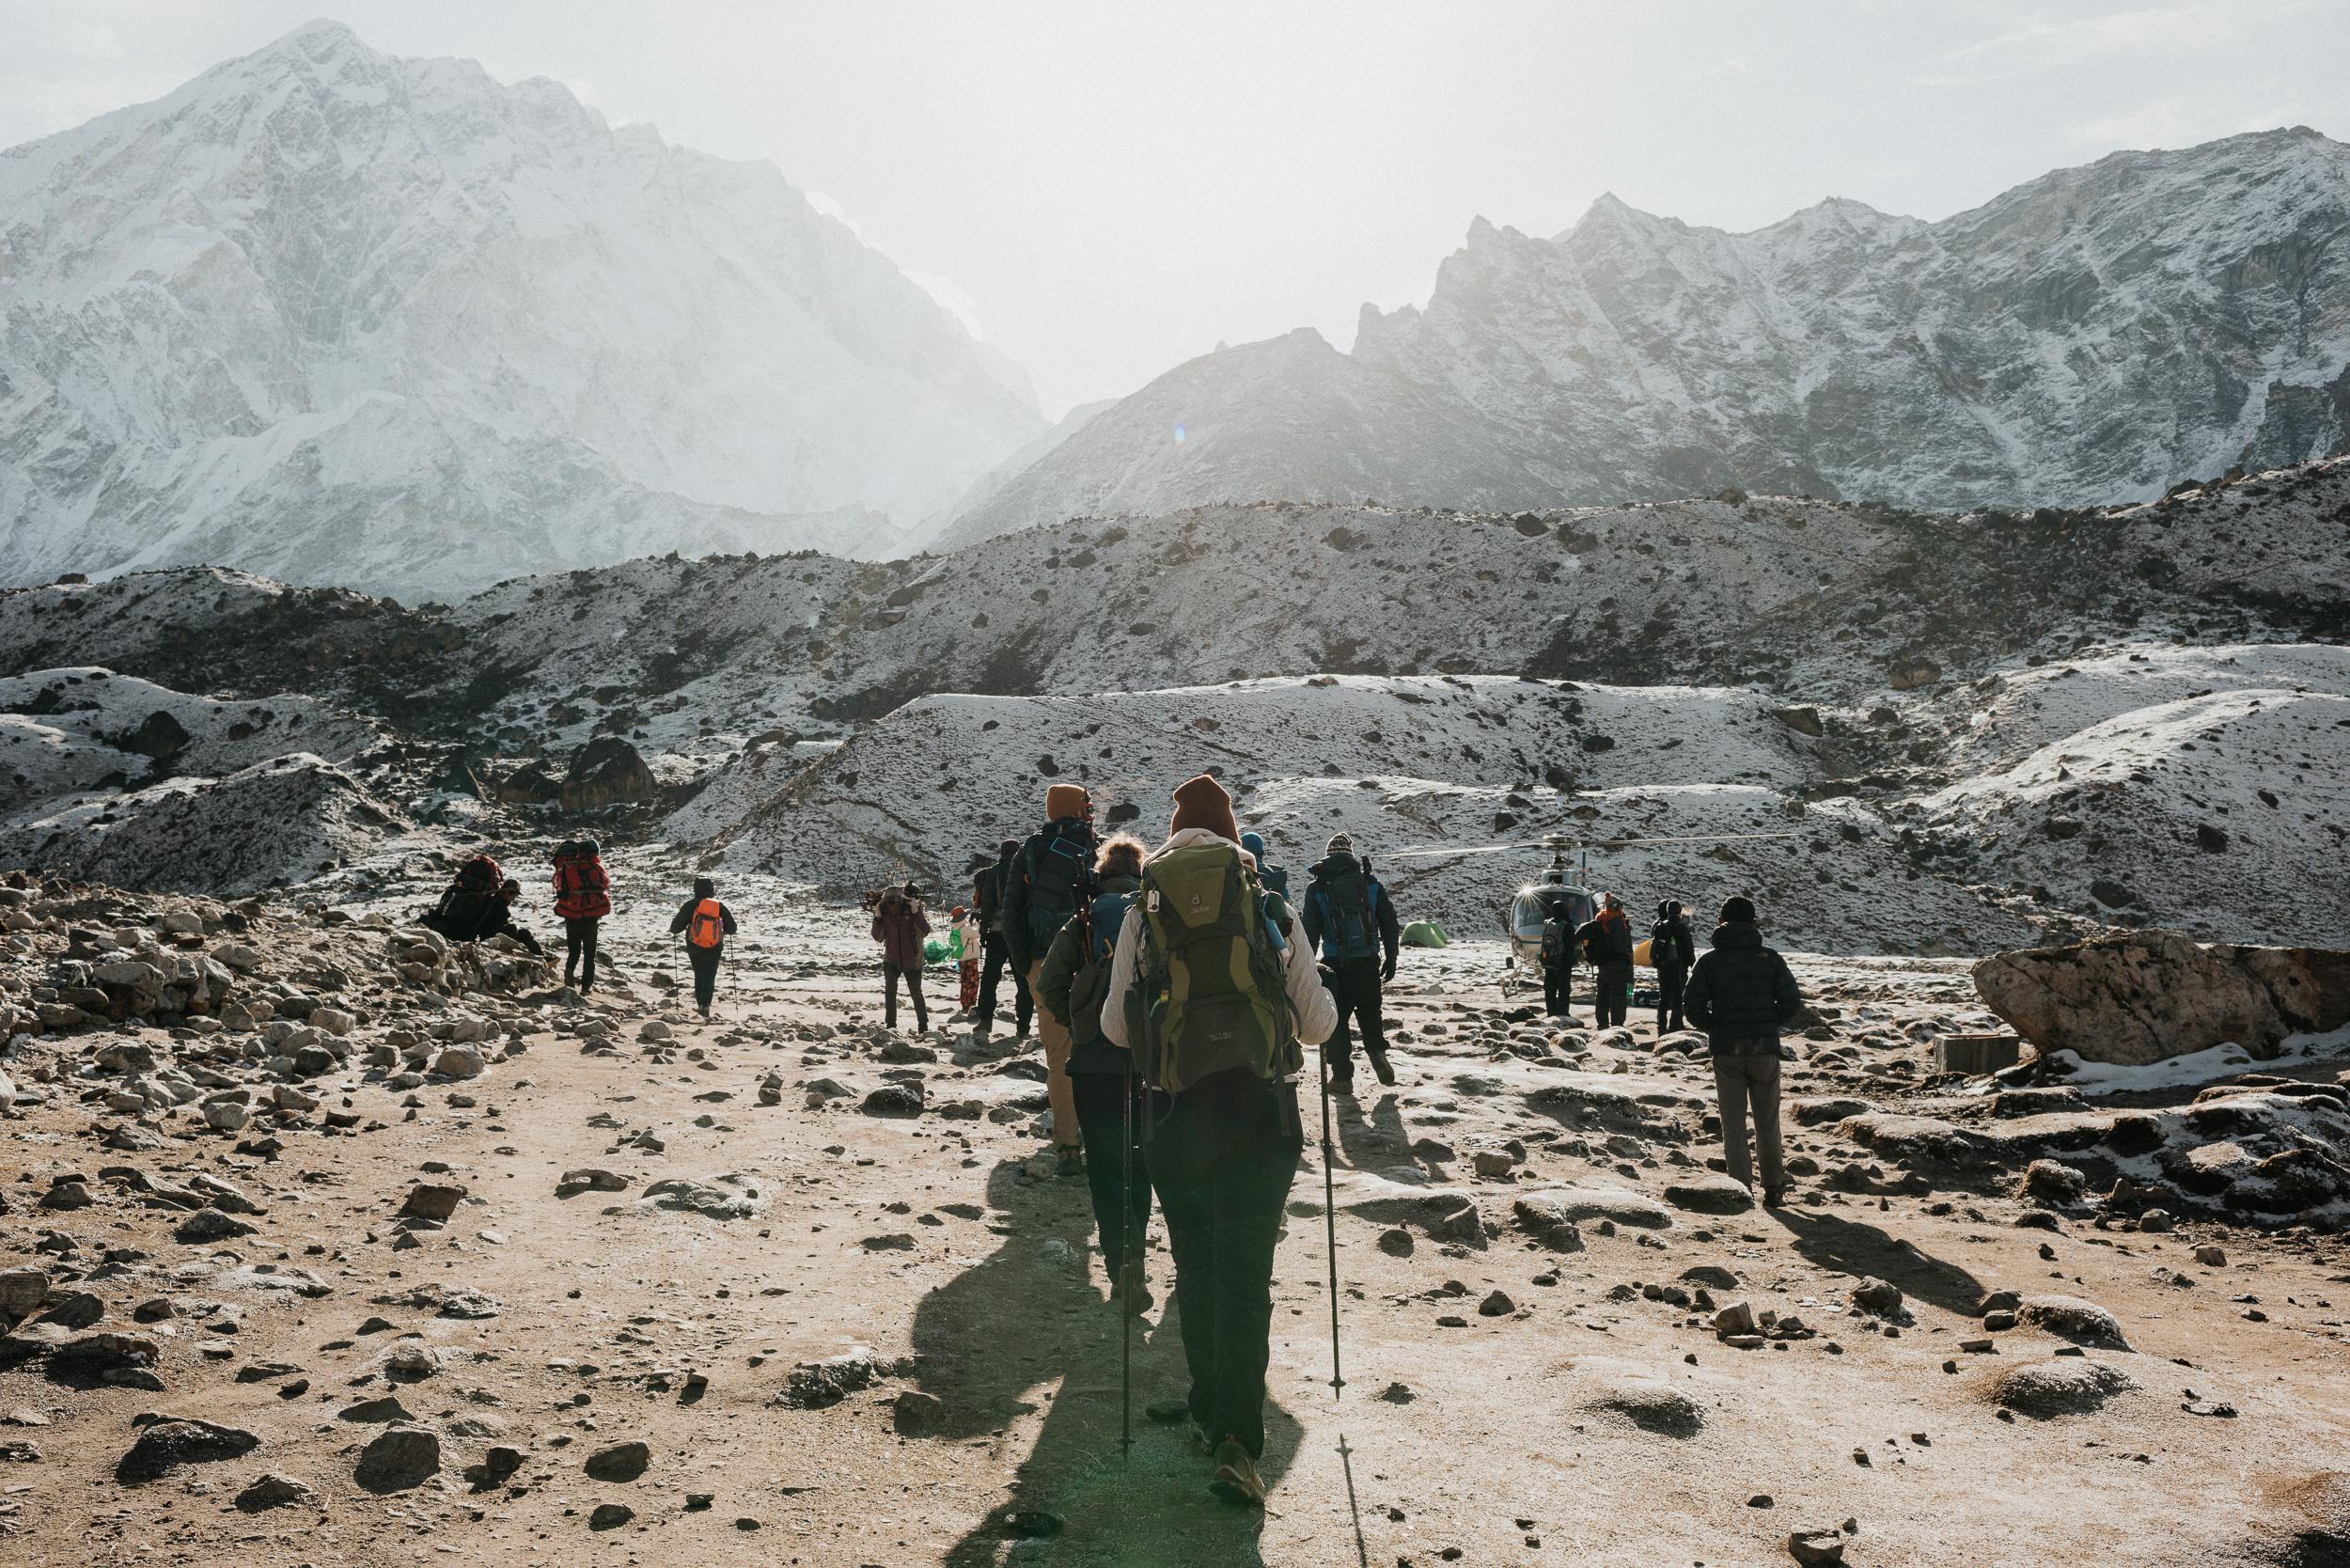 Nepal_EverestBaseCamp_2019_TaraShupe_Photography_DSC_4134.jpg